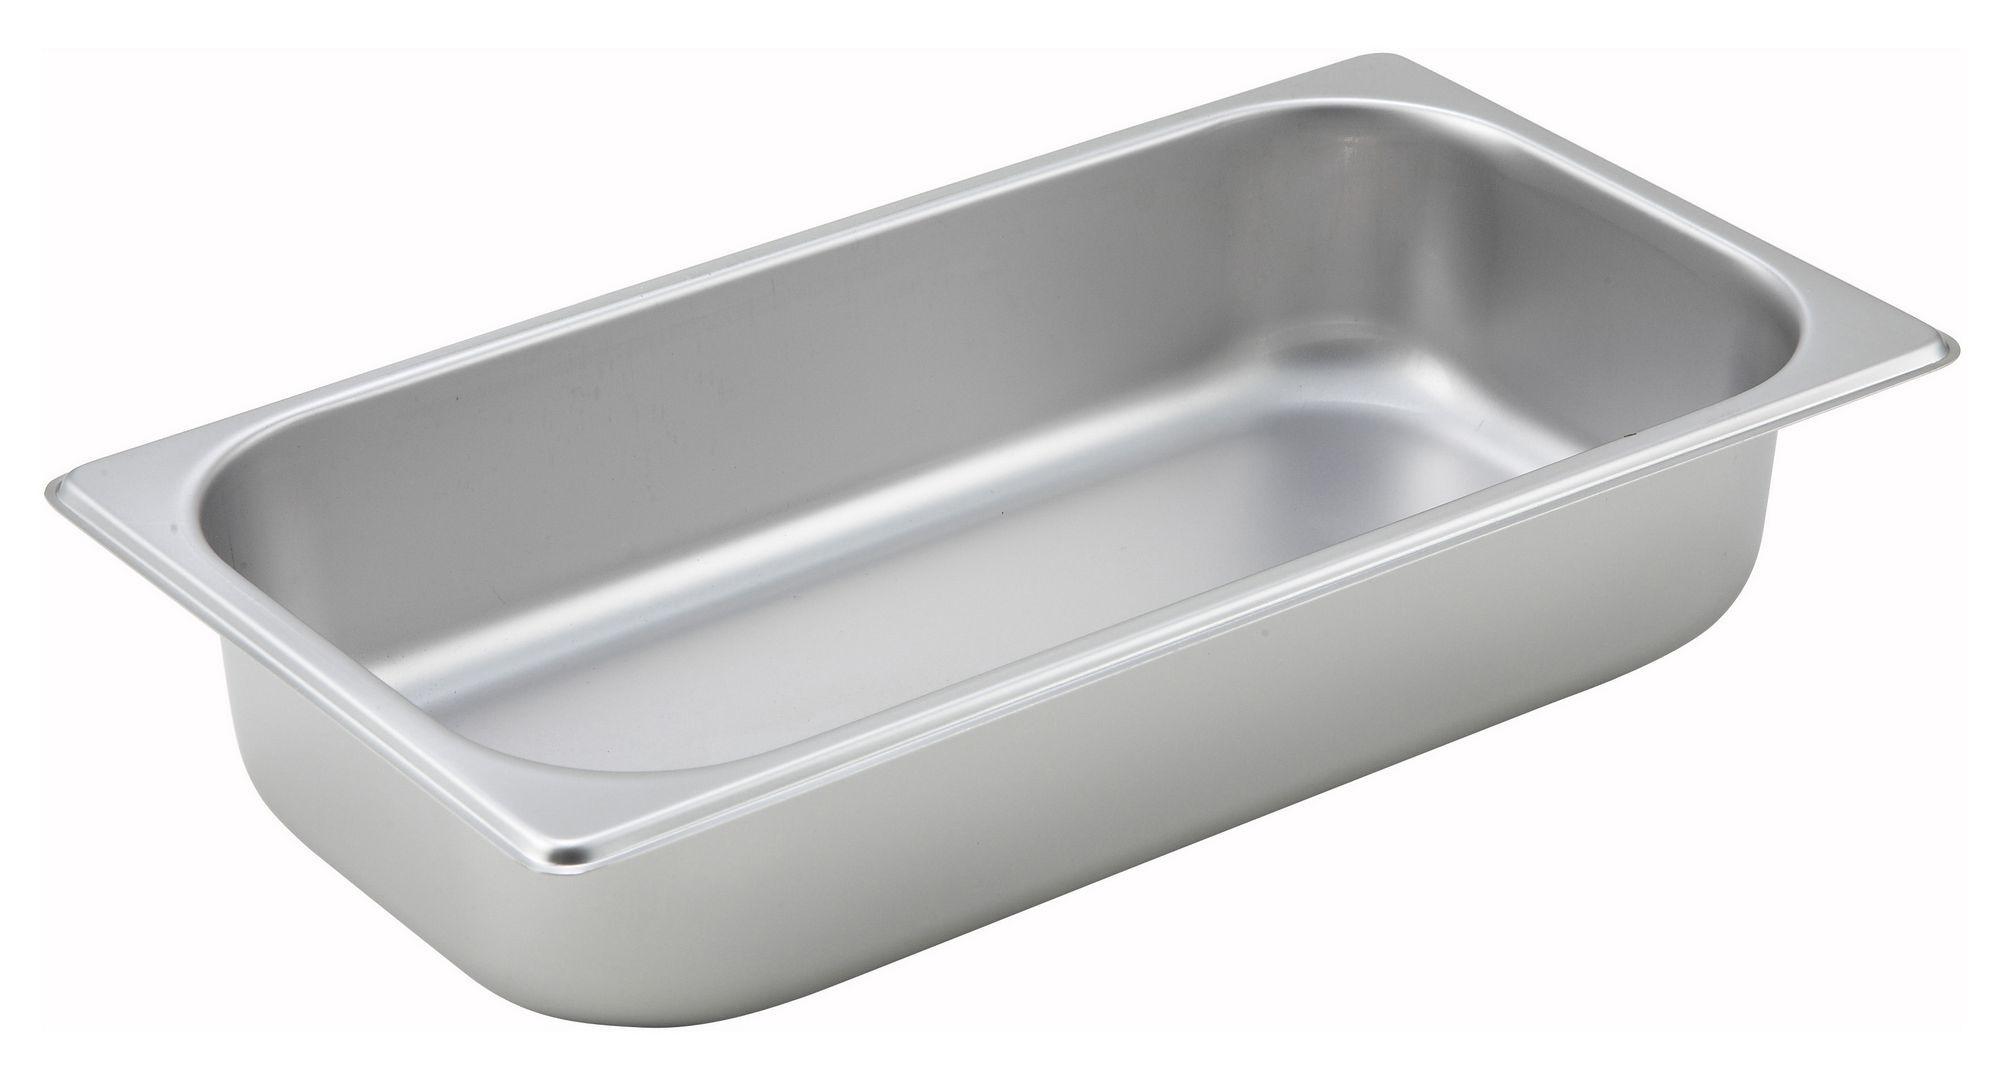 "Winco SPT2 1/3 Size Standard Weight Steam Table Pan 2-1/2"" Deep"